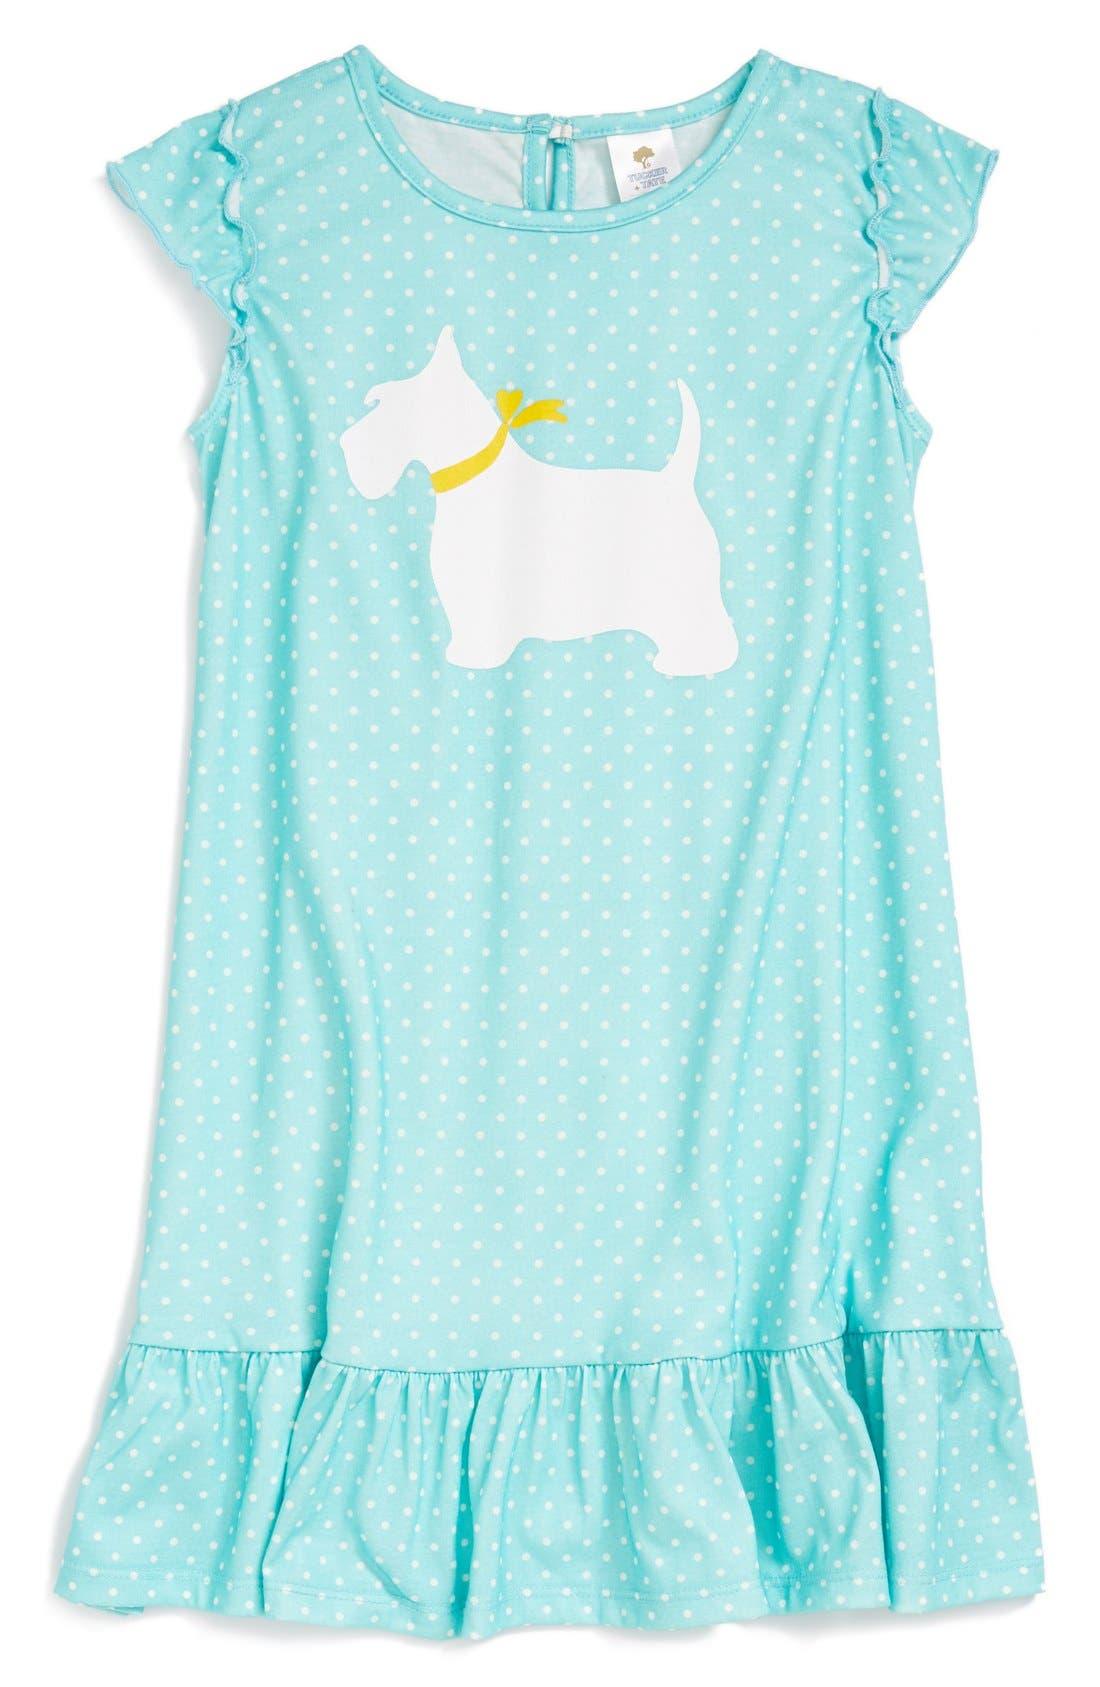 Main Image - Tucker + Tate Ruffle Nightgown (Toddler Girls, Little Girls & Big Girls)